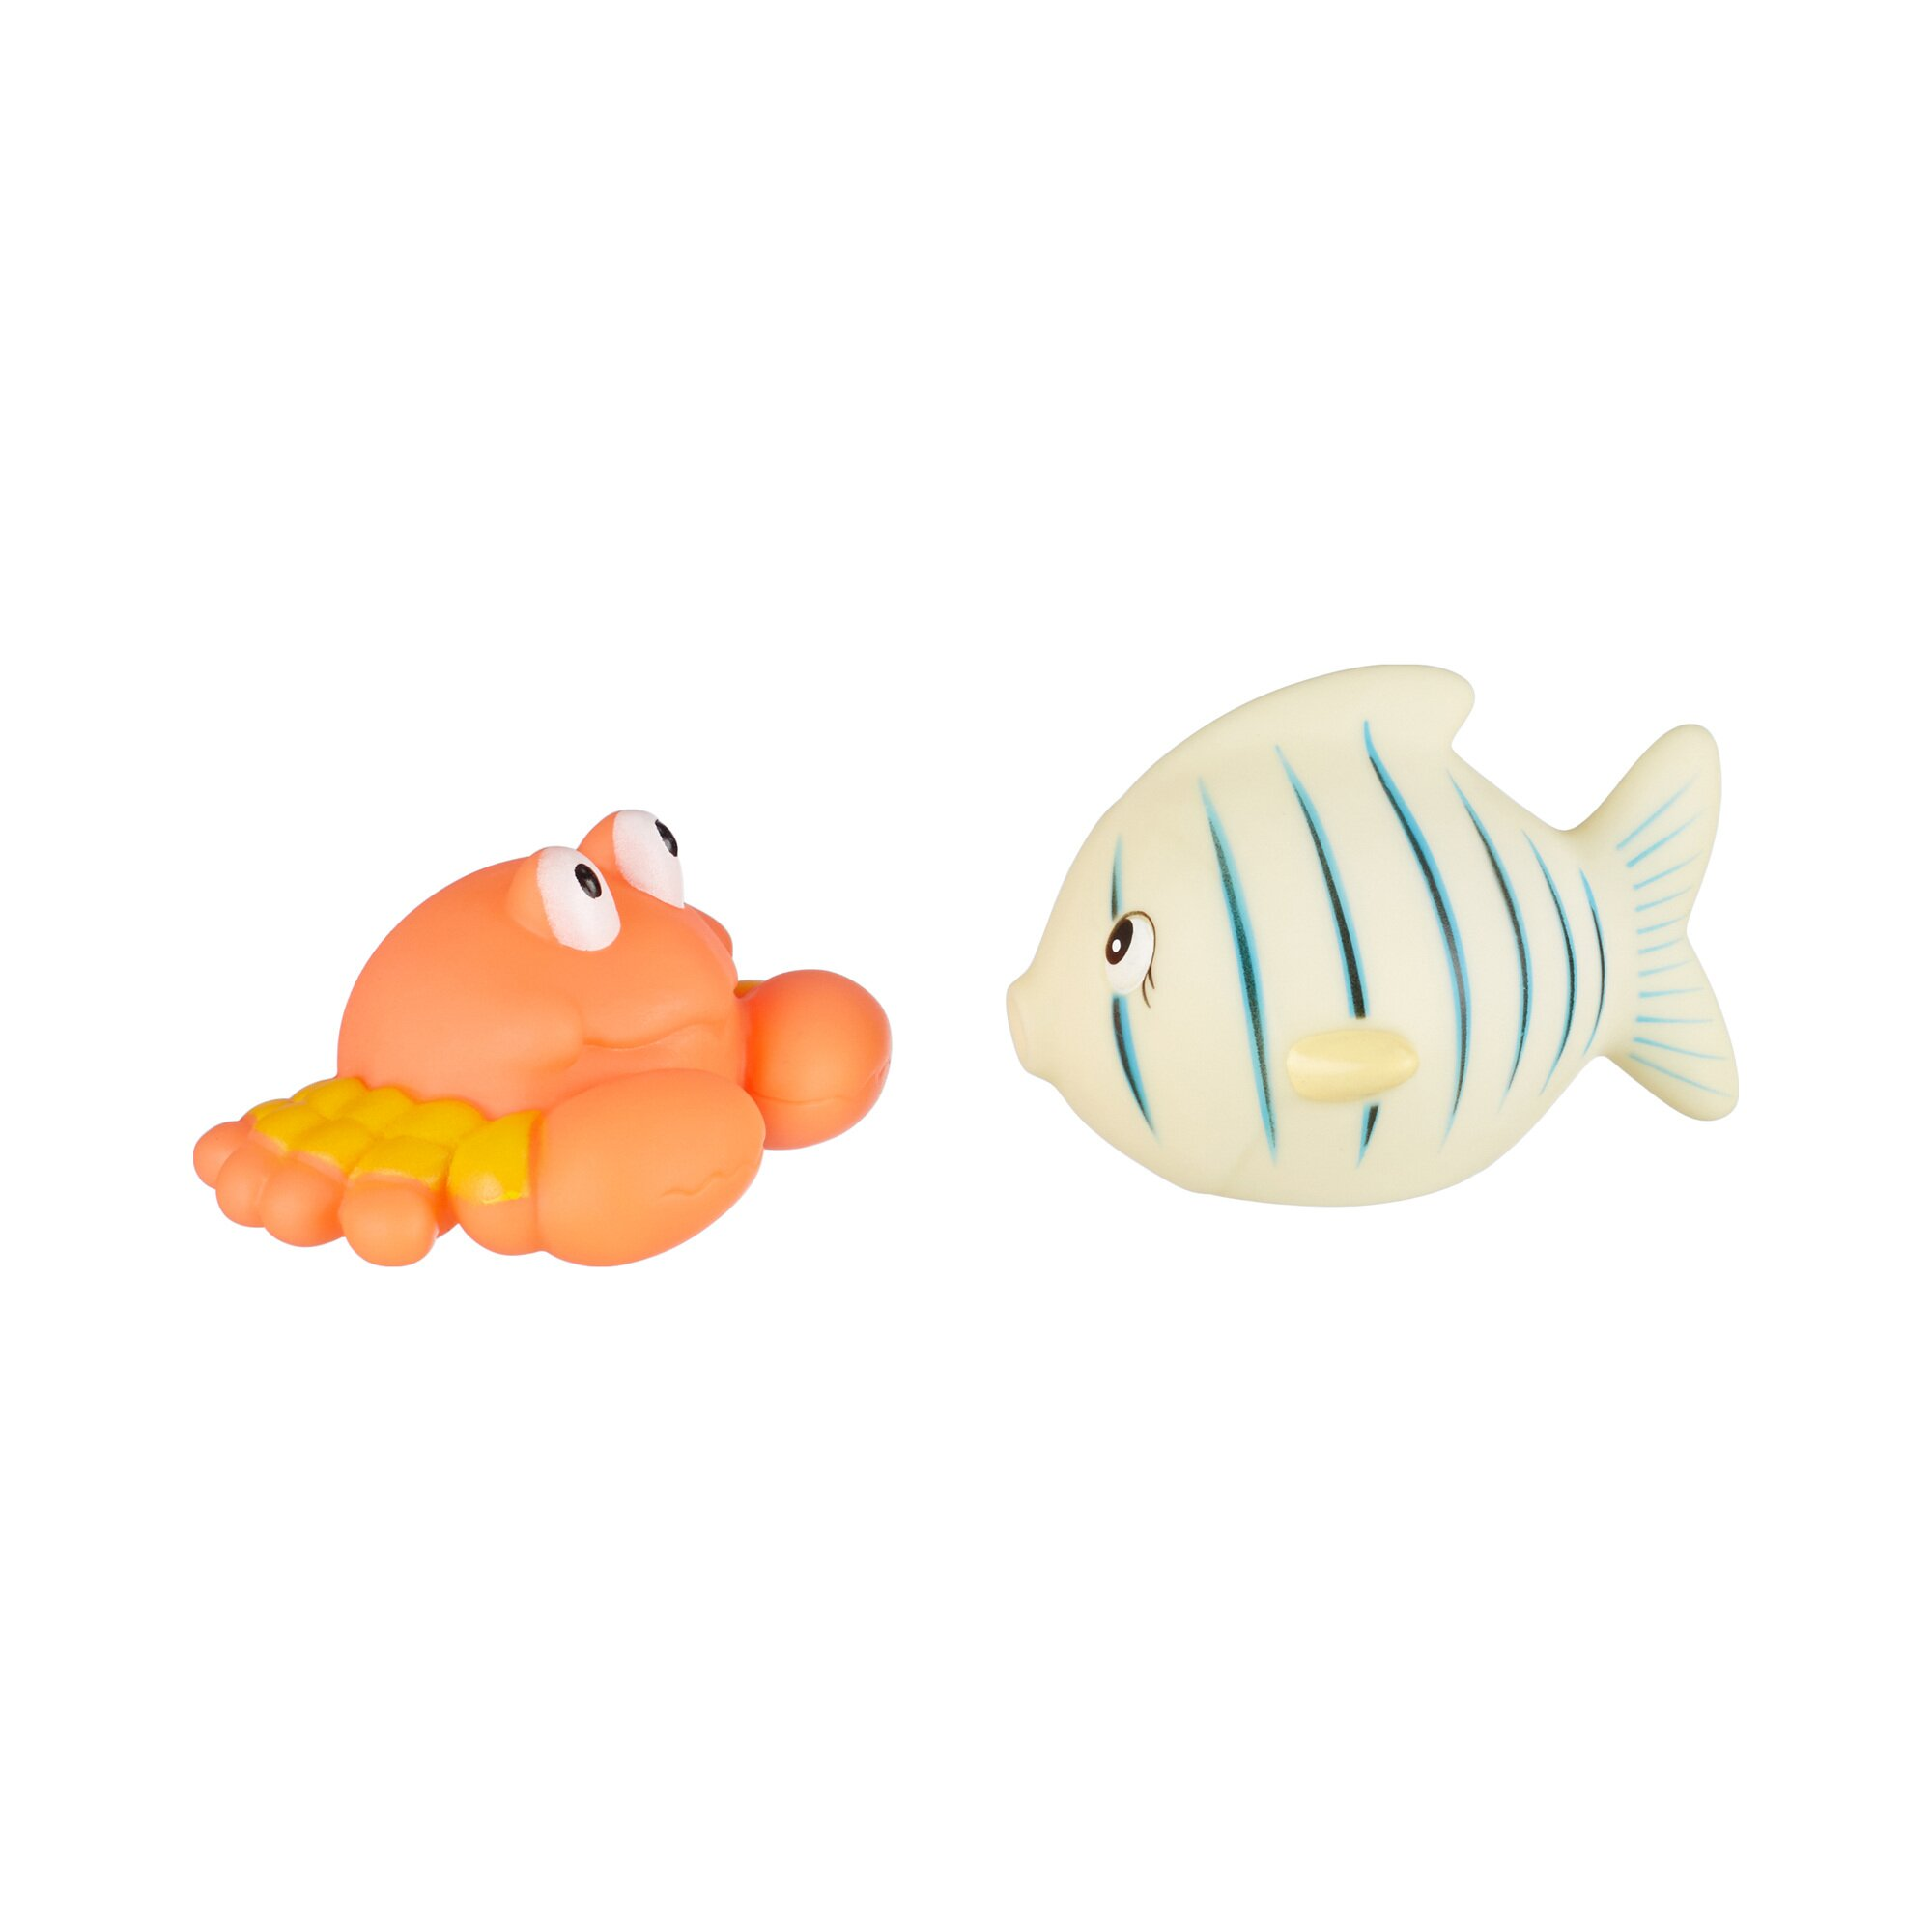 solini-badespielzeug-badewannen-freunde